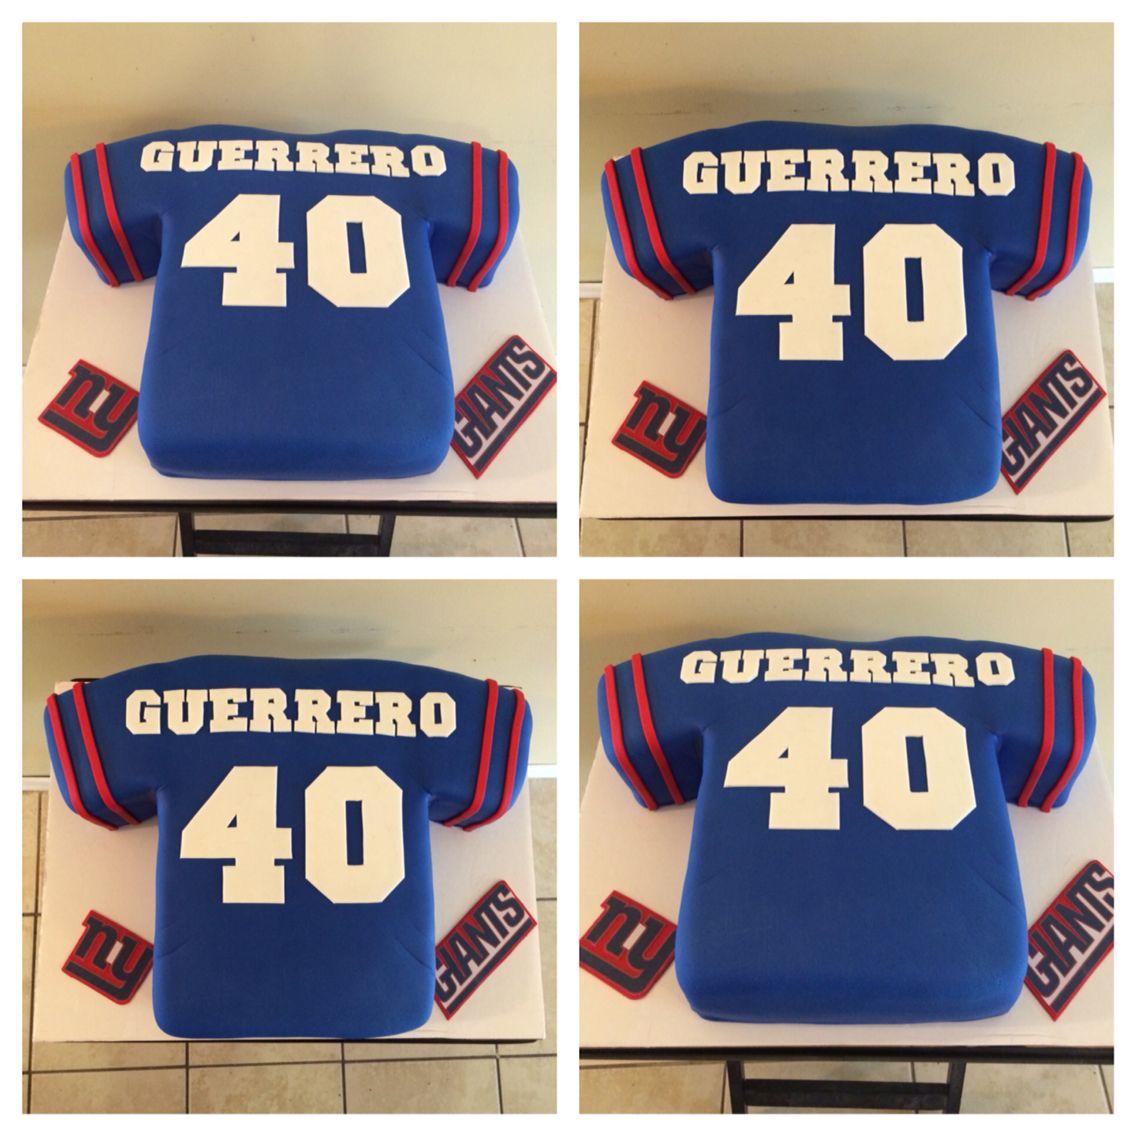 best service 08a19 e9691 NY GIANTS JERSEY CAKE | CAKES | Ny giants cake, Giant cake ...